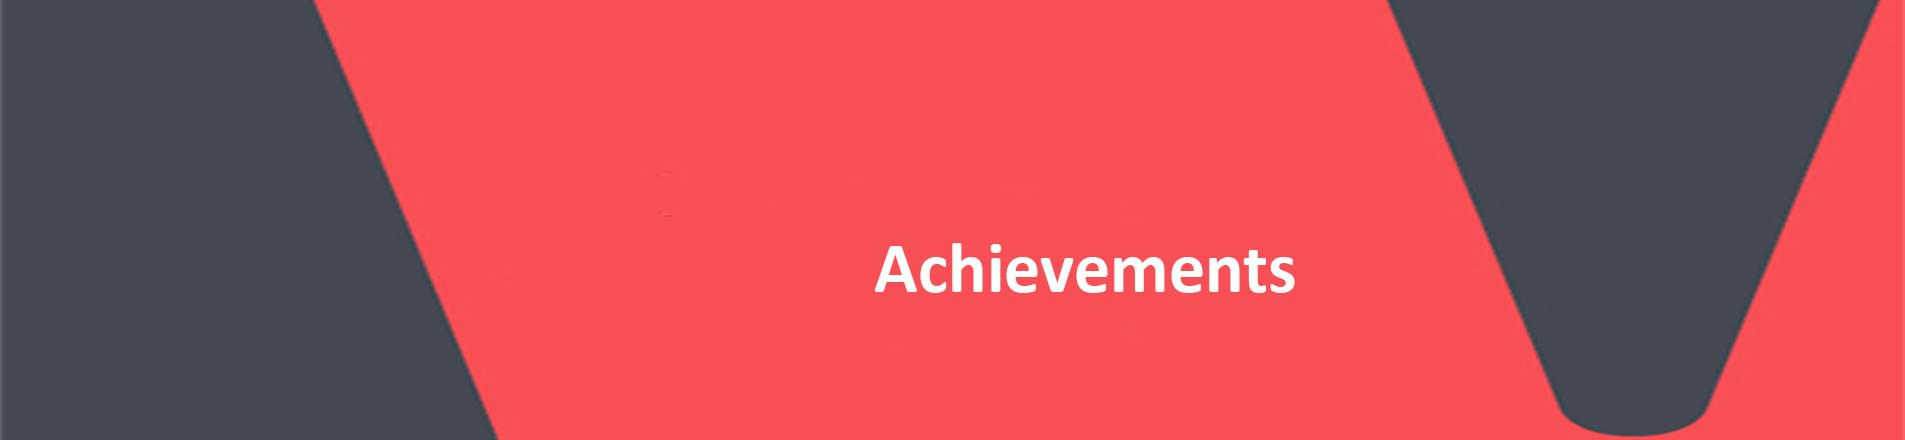 Achievements on red VERCIDA background